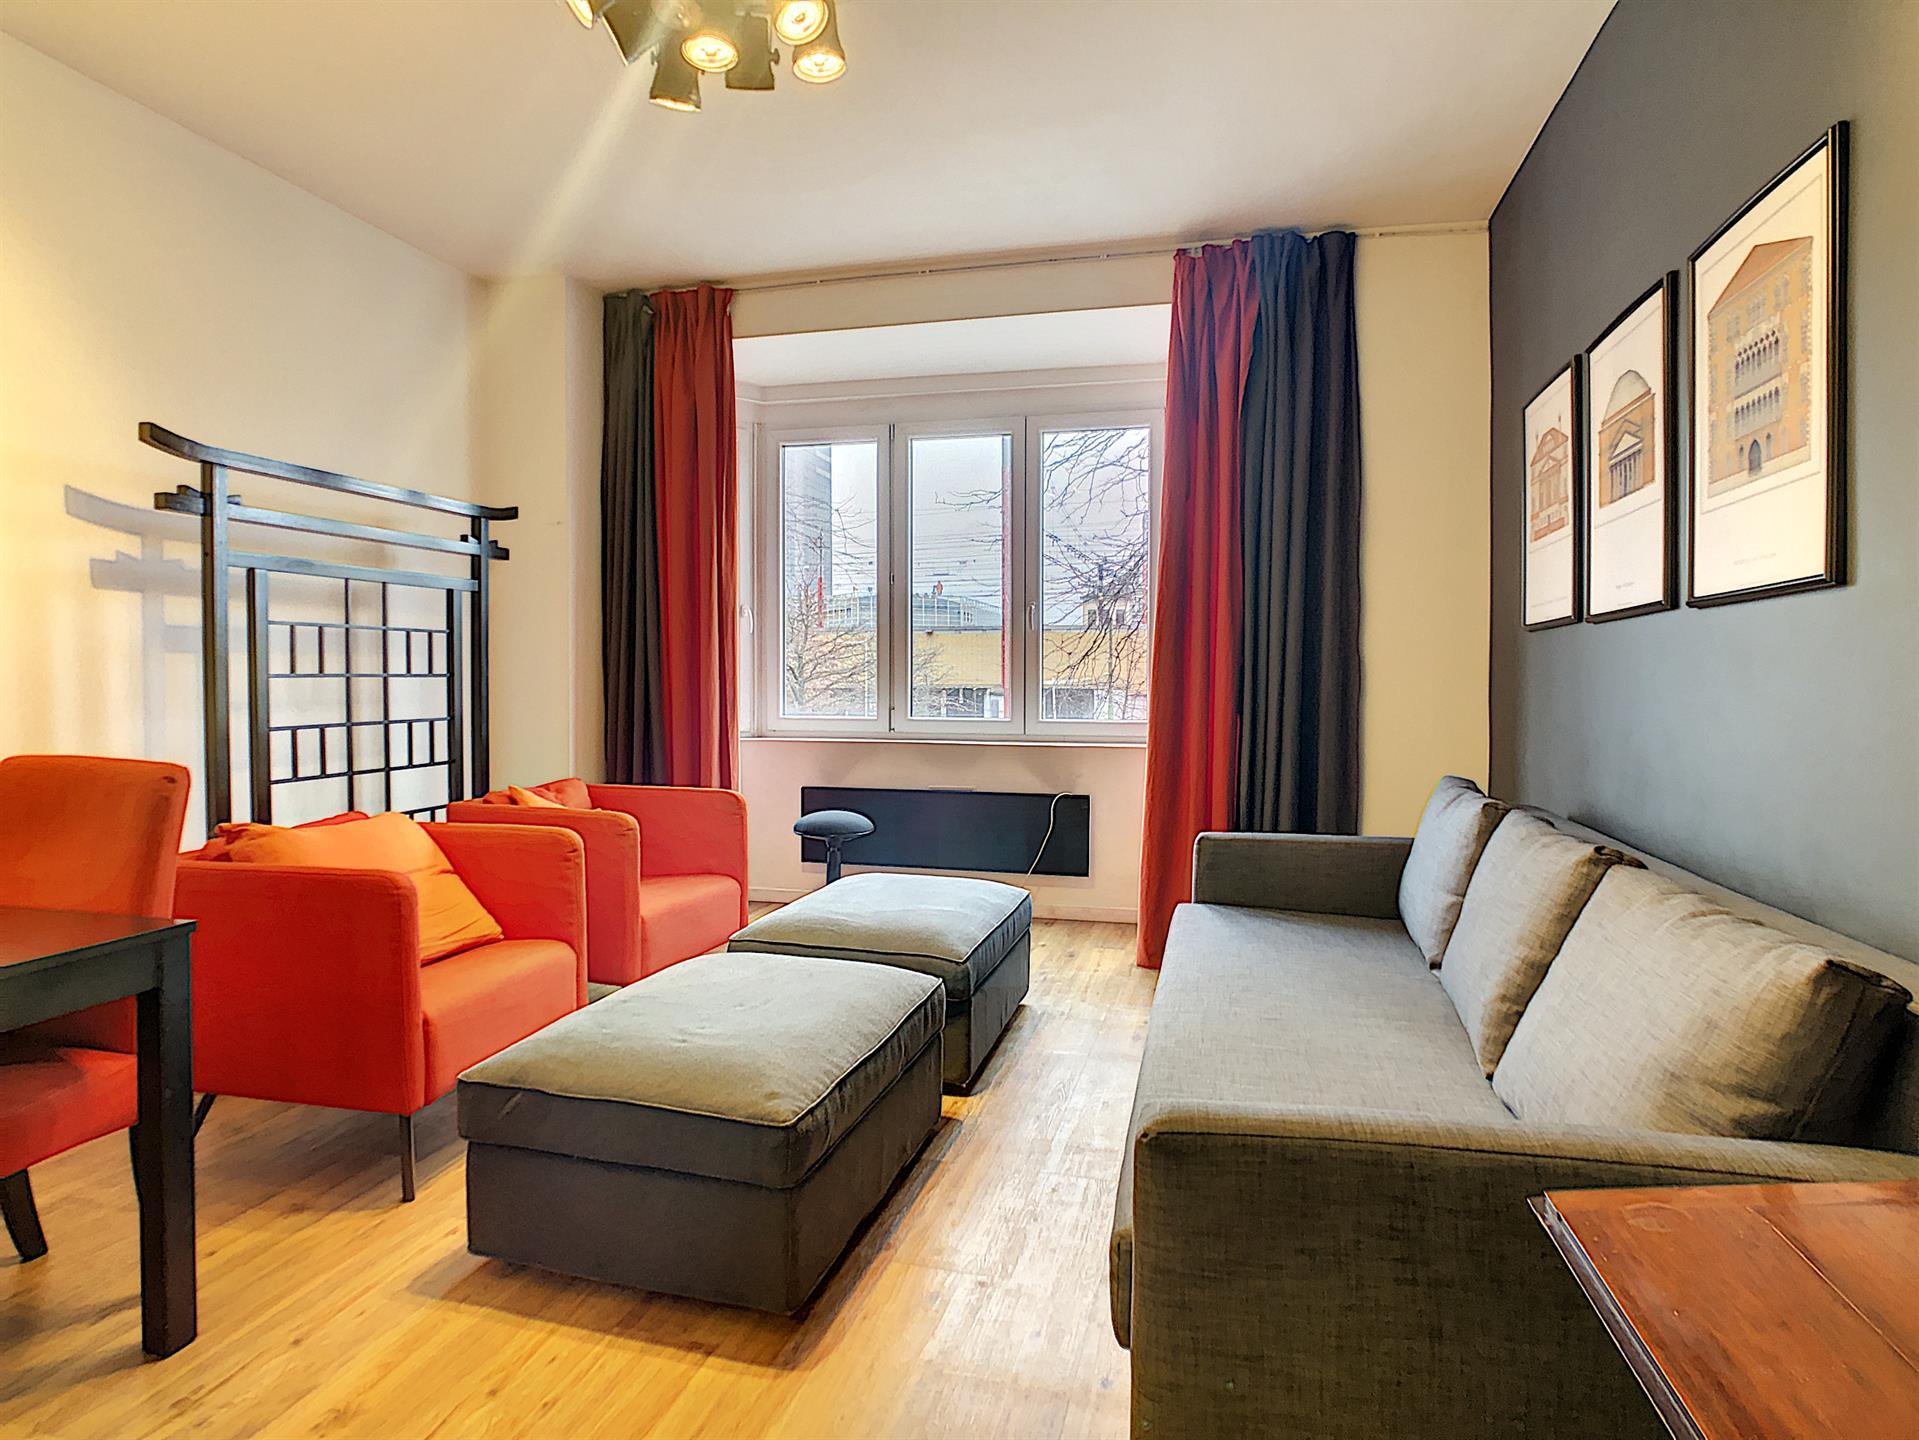 Appartement - Sint-Gillis - #4236948-4